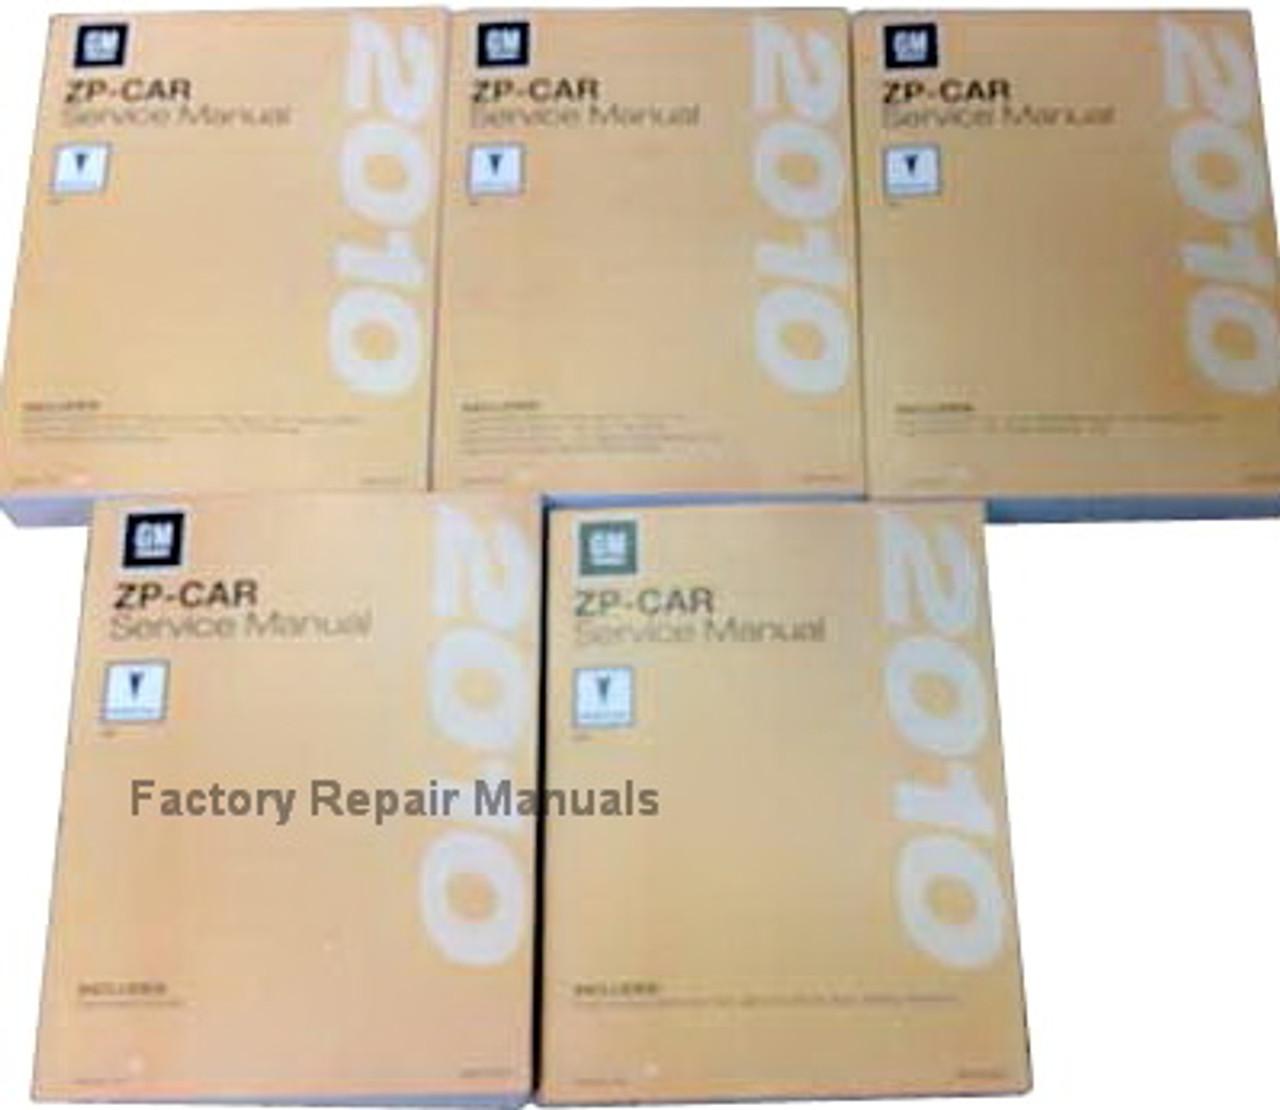 2010 Pontiac G6 Factory Shop Service Manual 5 Volume Set